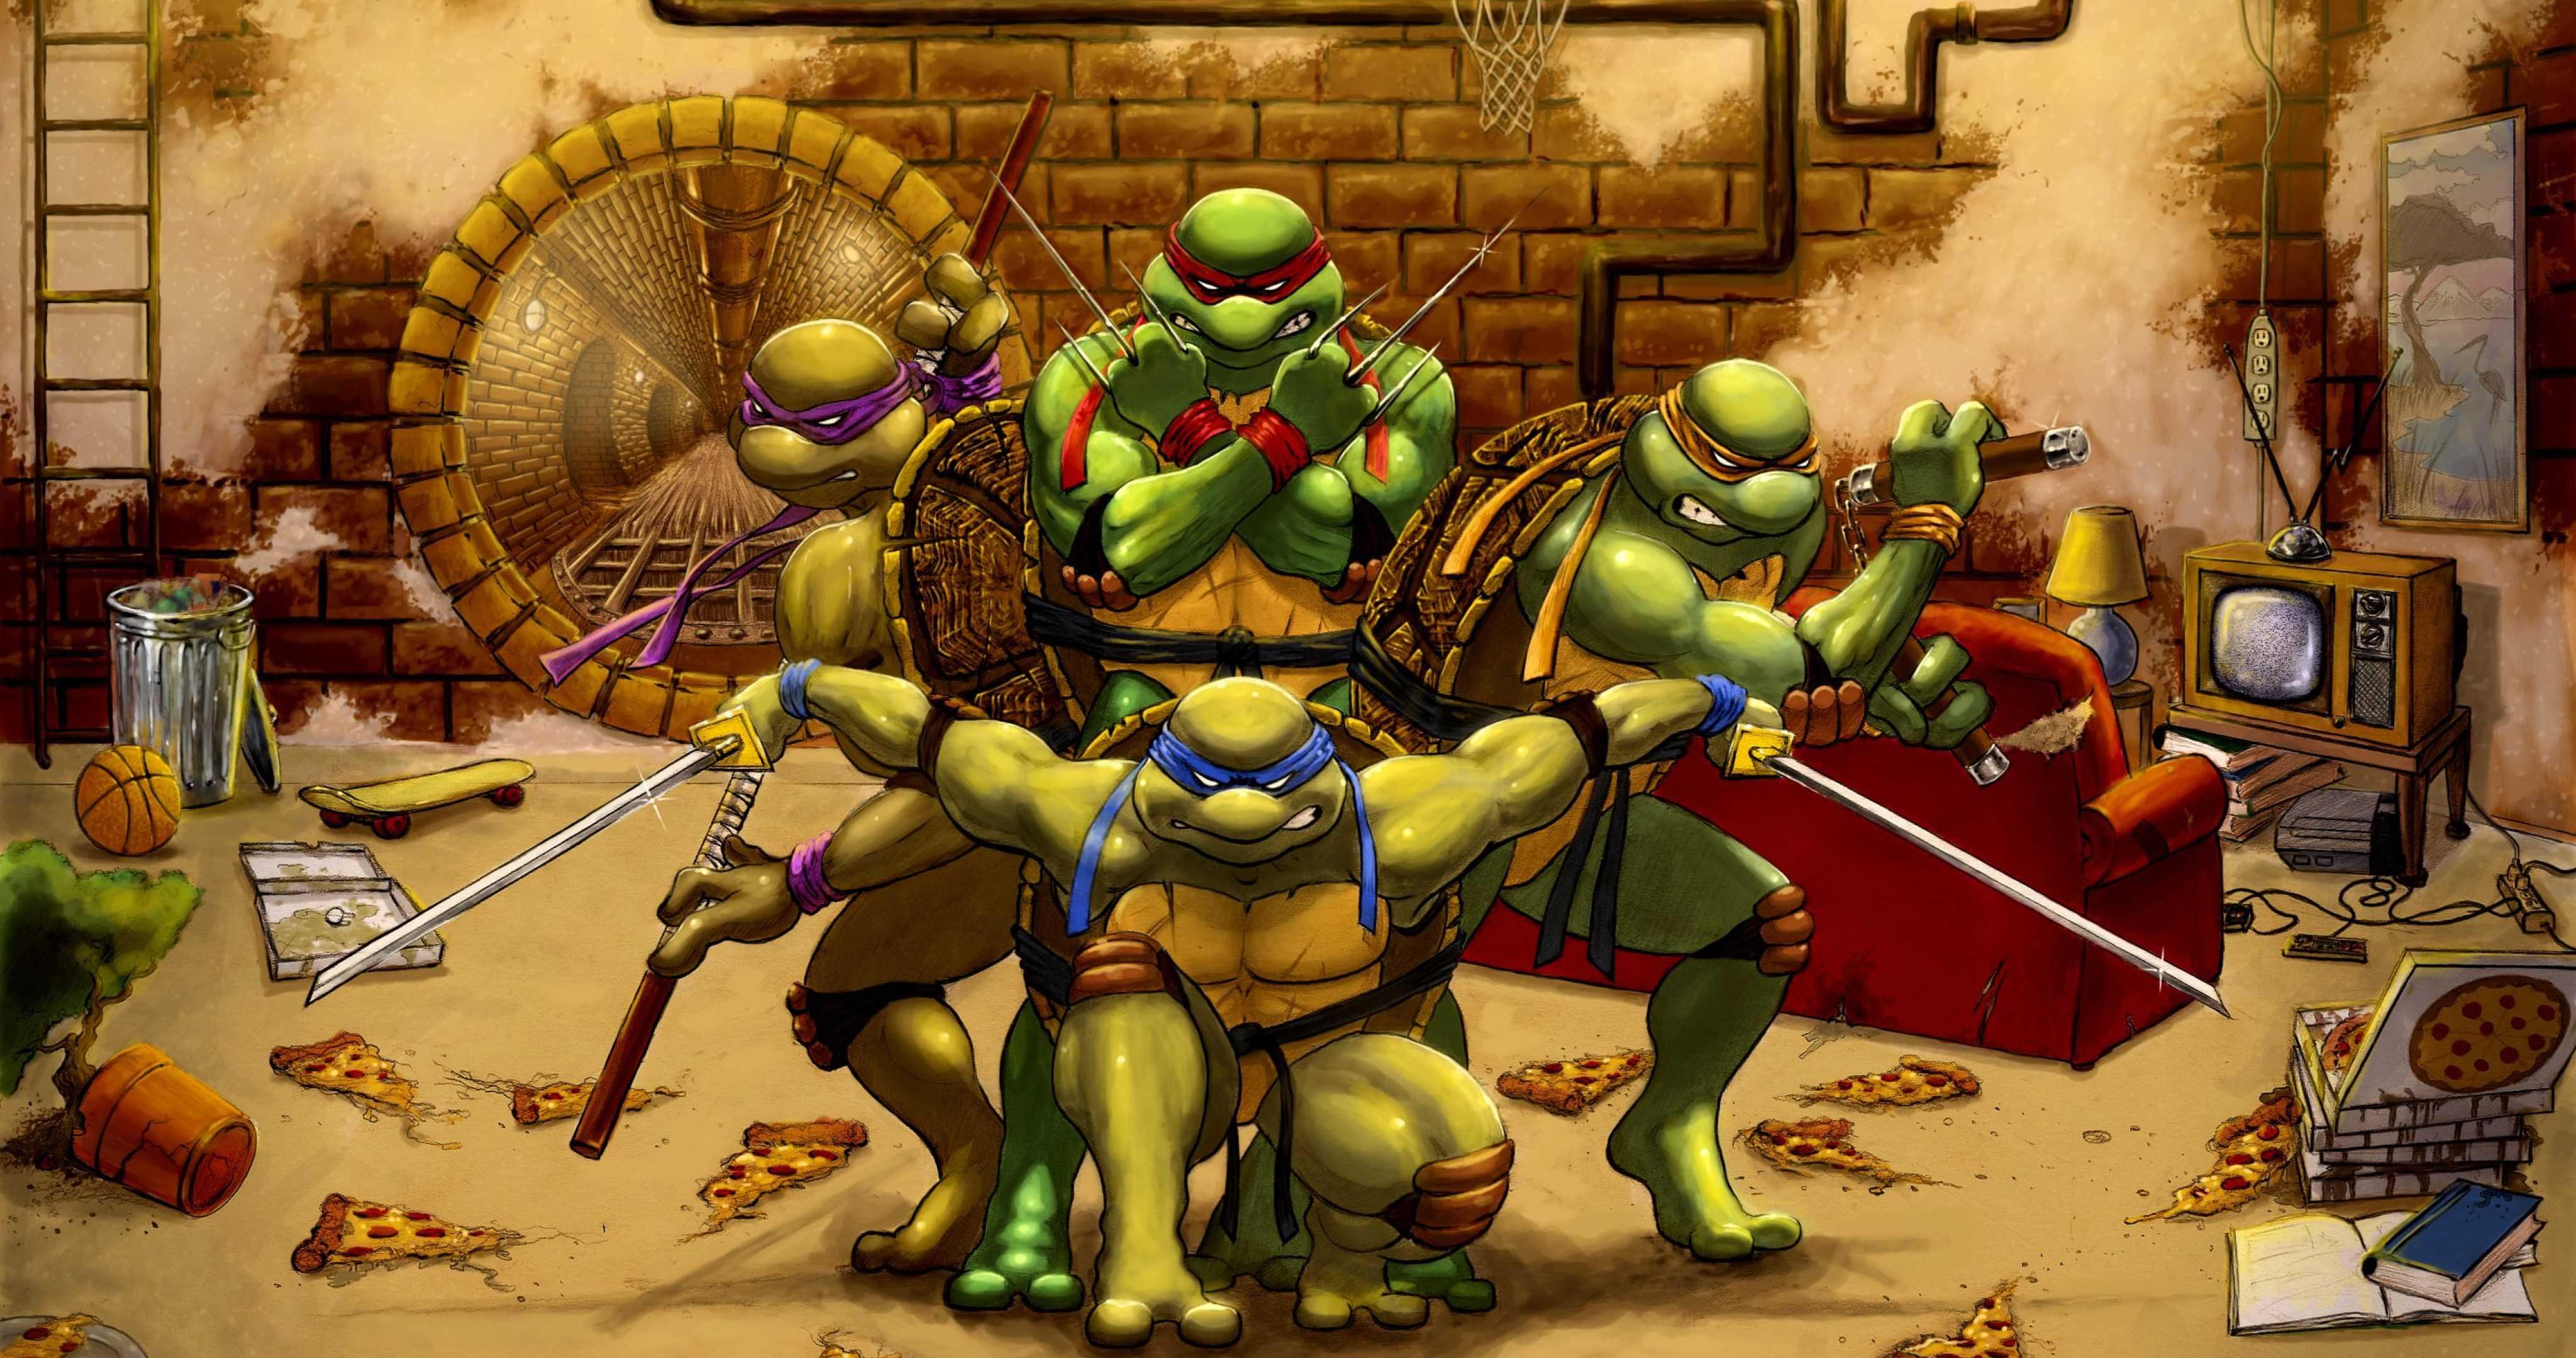 New Ninja Turtles Wallpapers - Top Free New Ninja Turtles ...